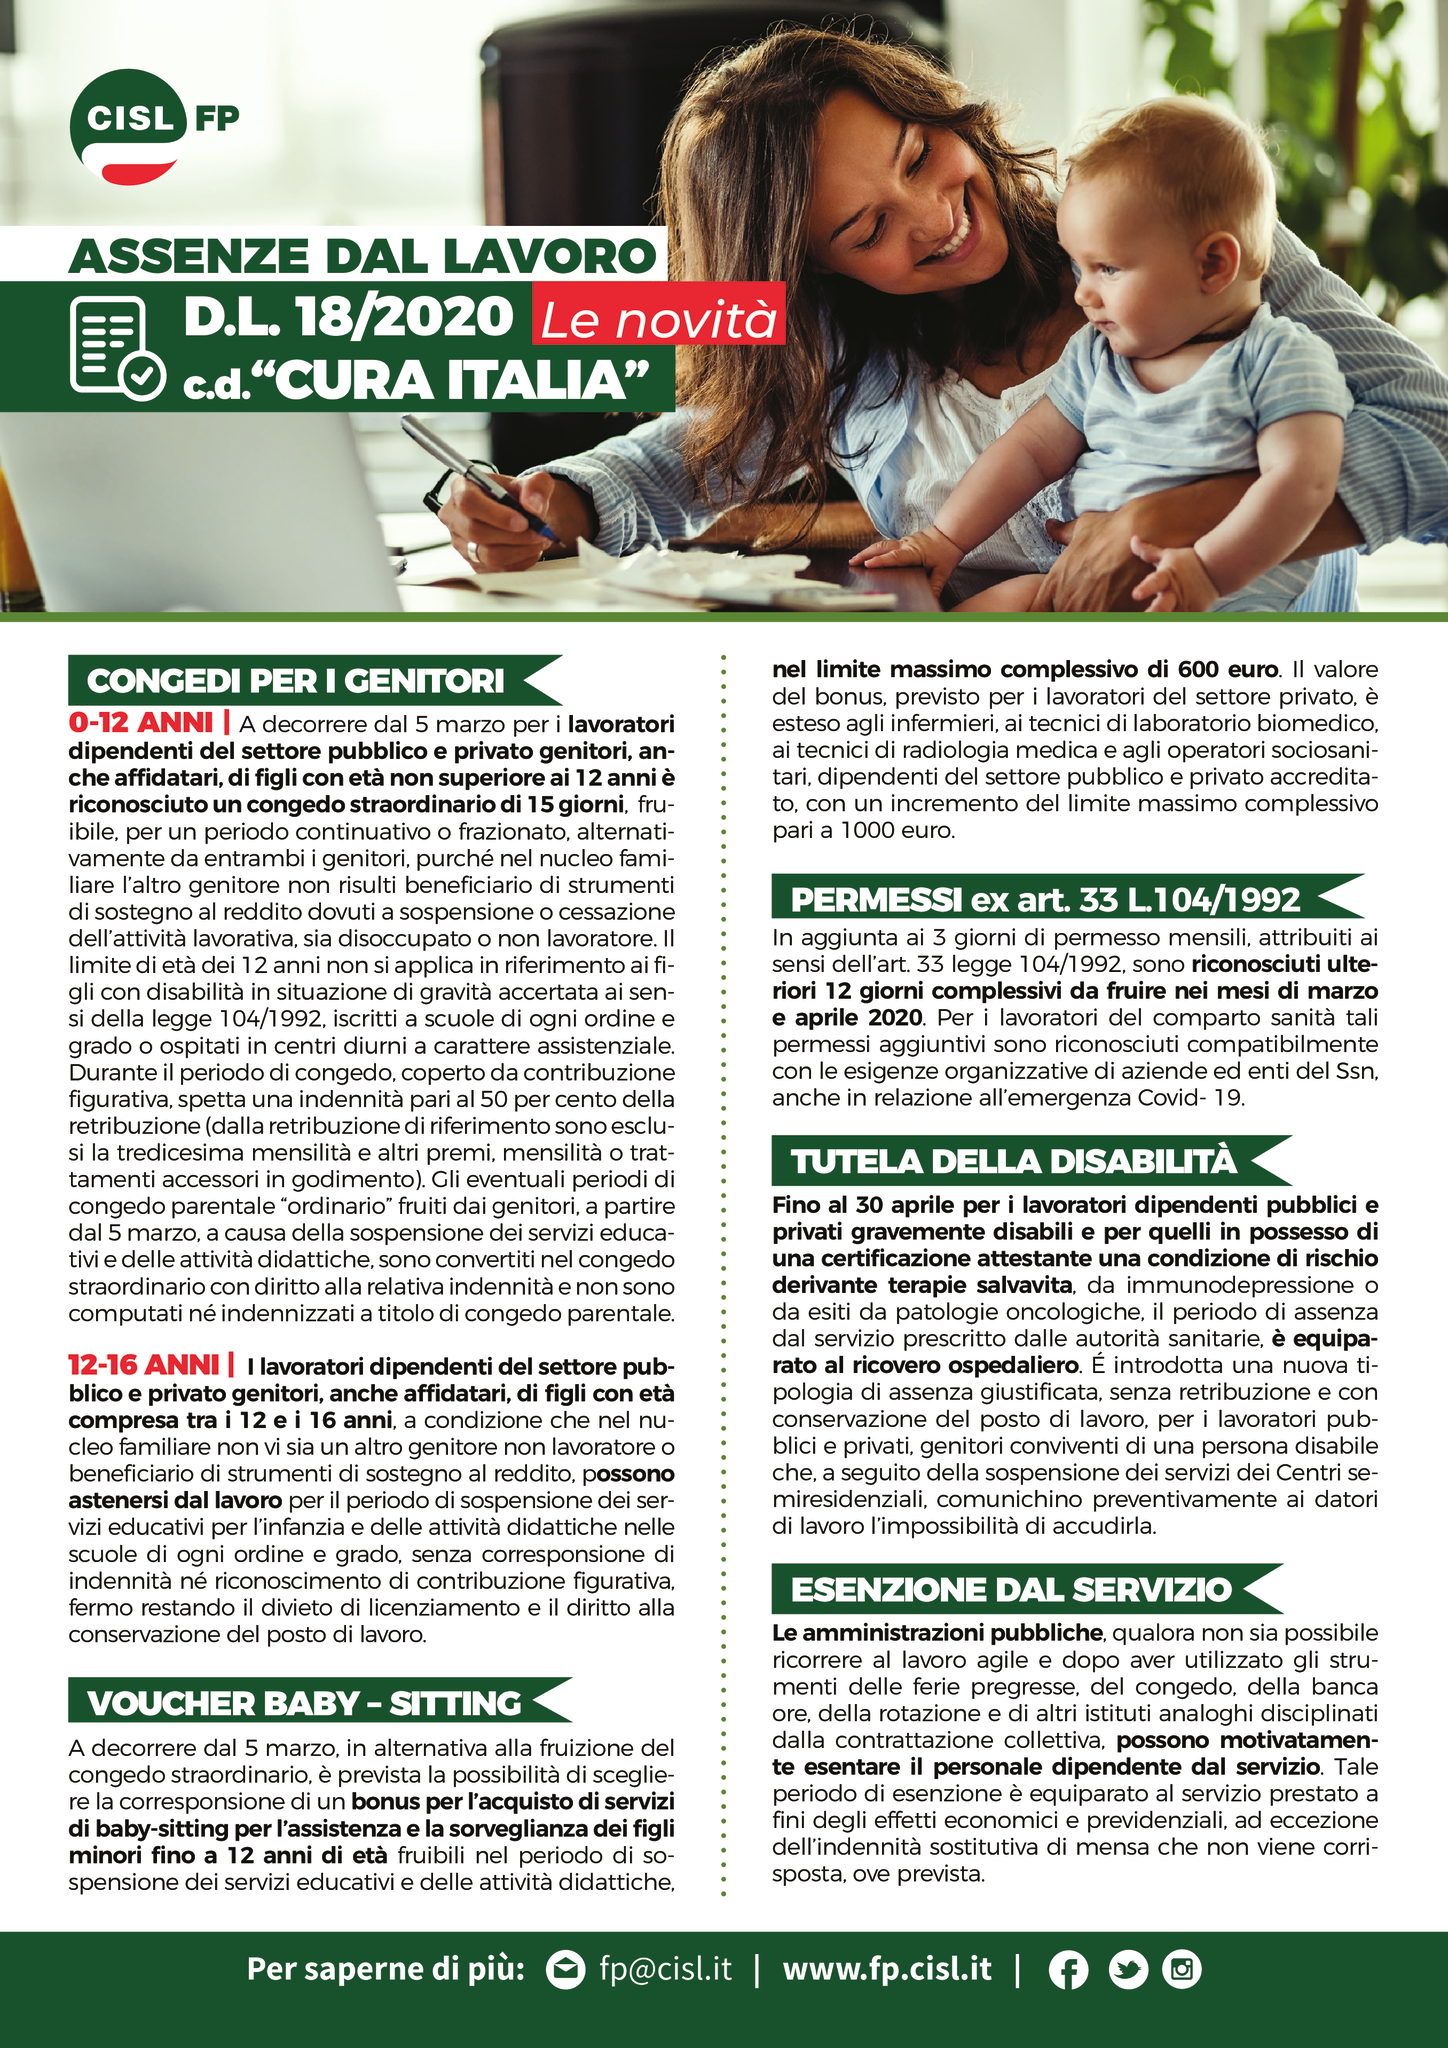 thumbnail of decreto cura italia_assenze.pdf (2) 2